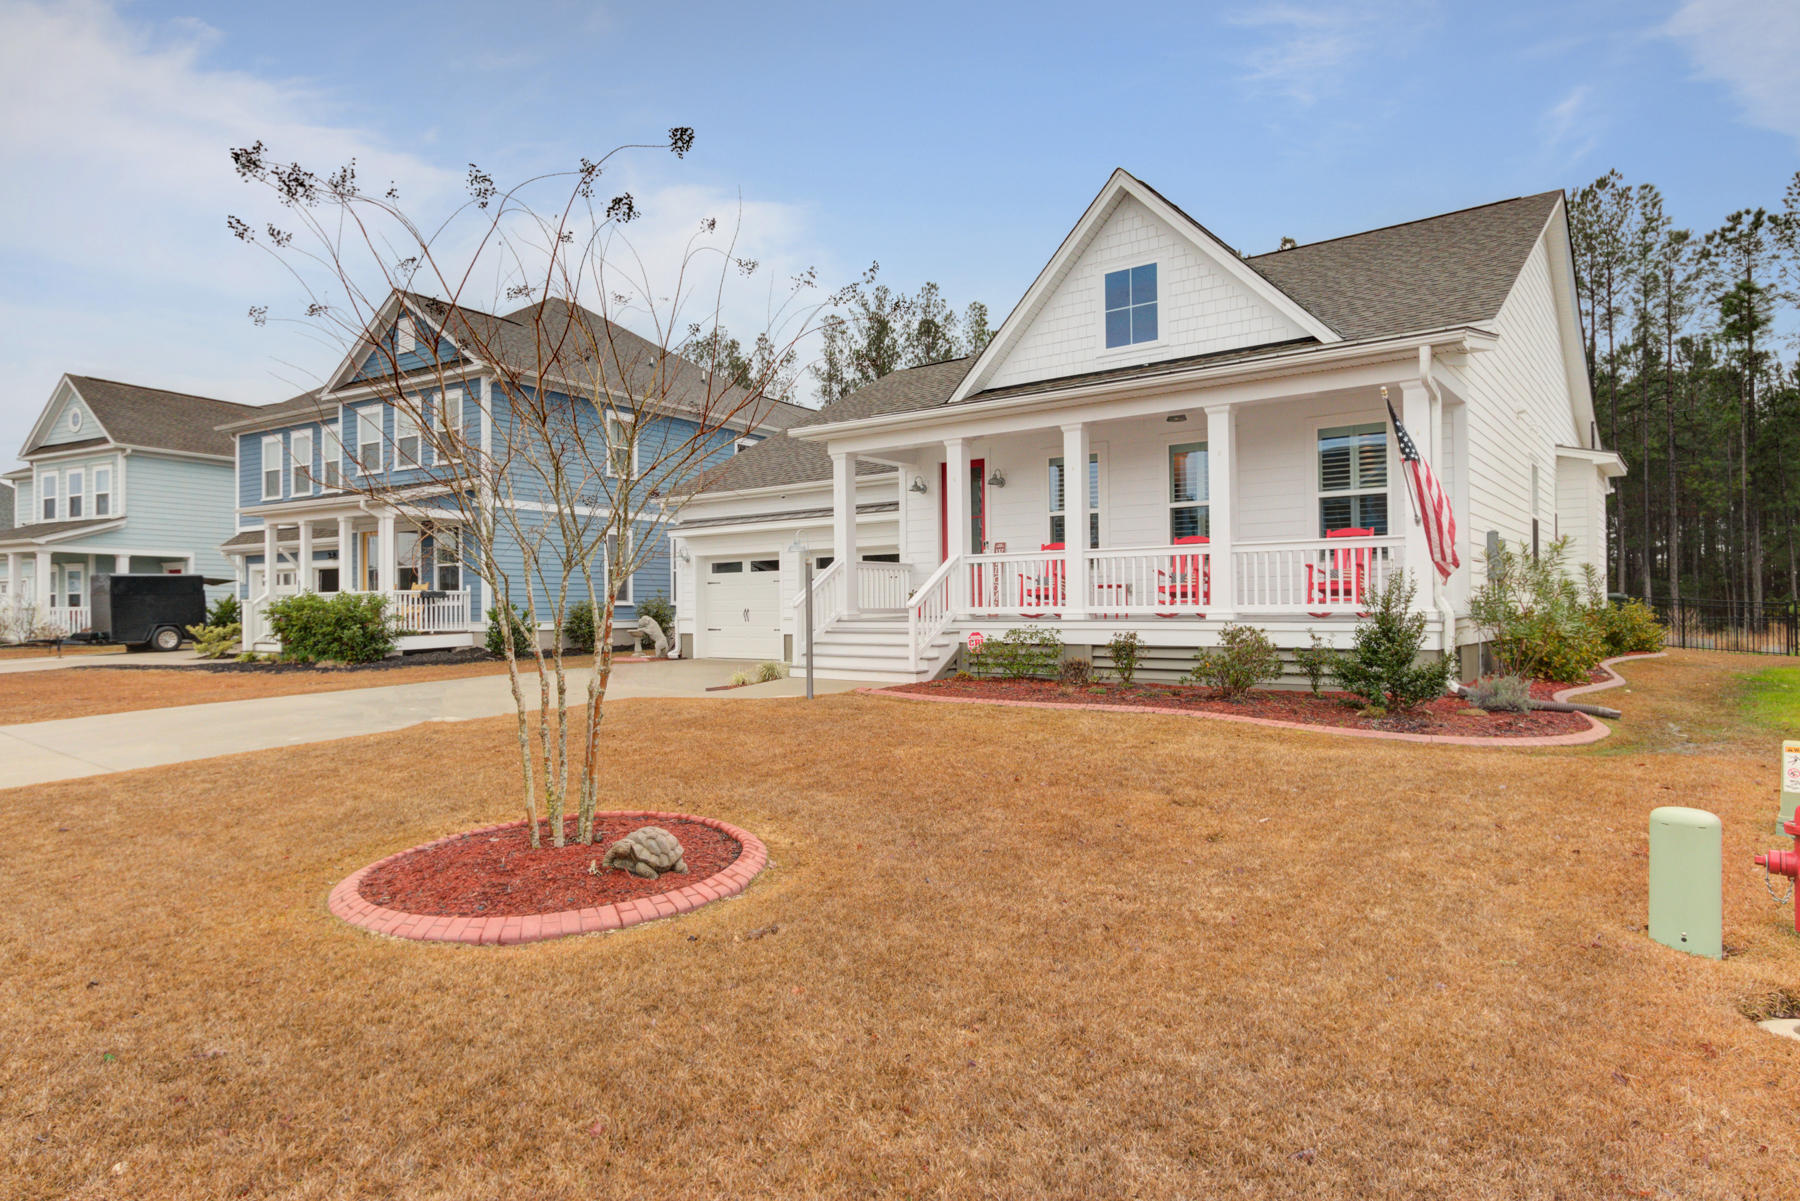 Cane Bay Plantation Homes For Sale - 251 Calm Water, Summerville, SC - 8